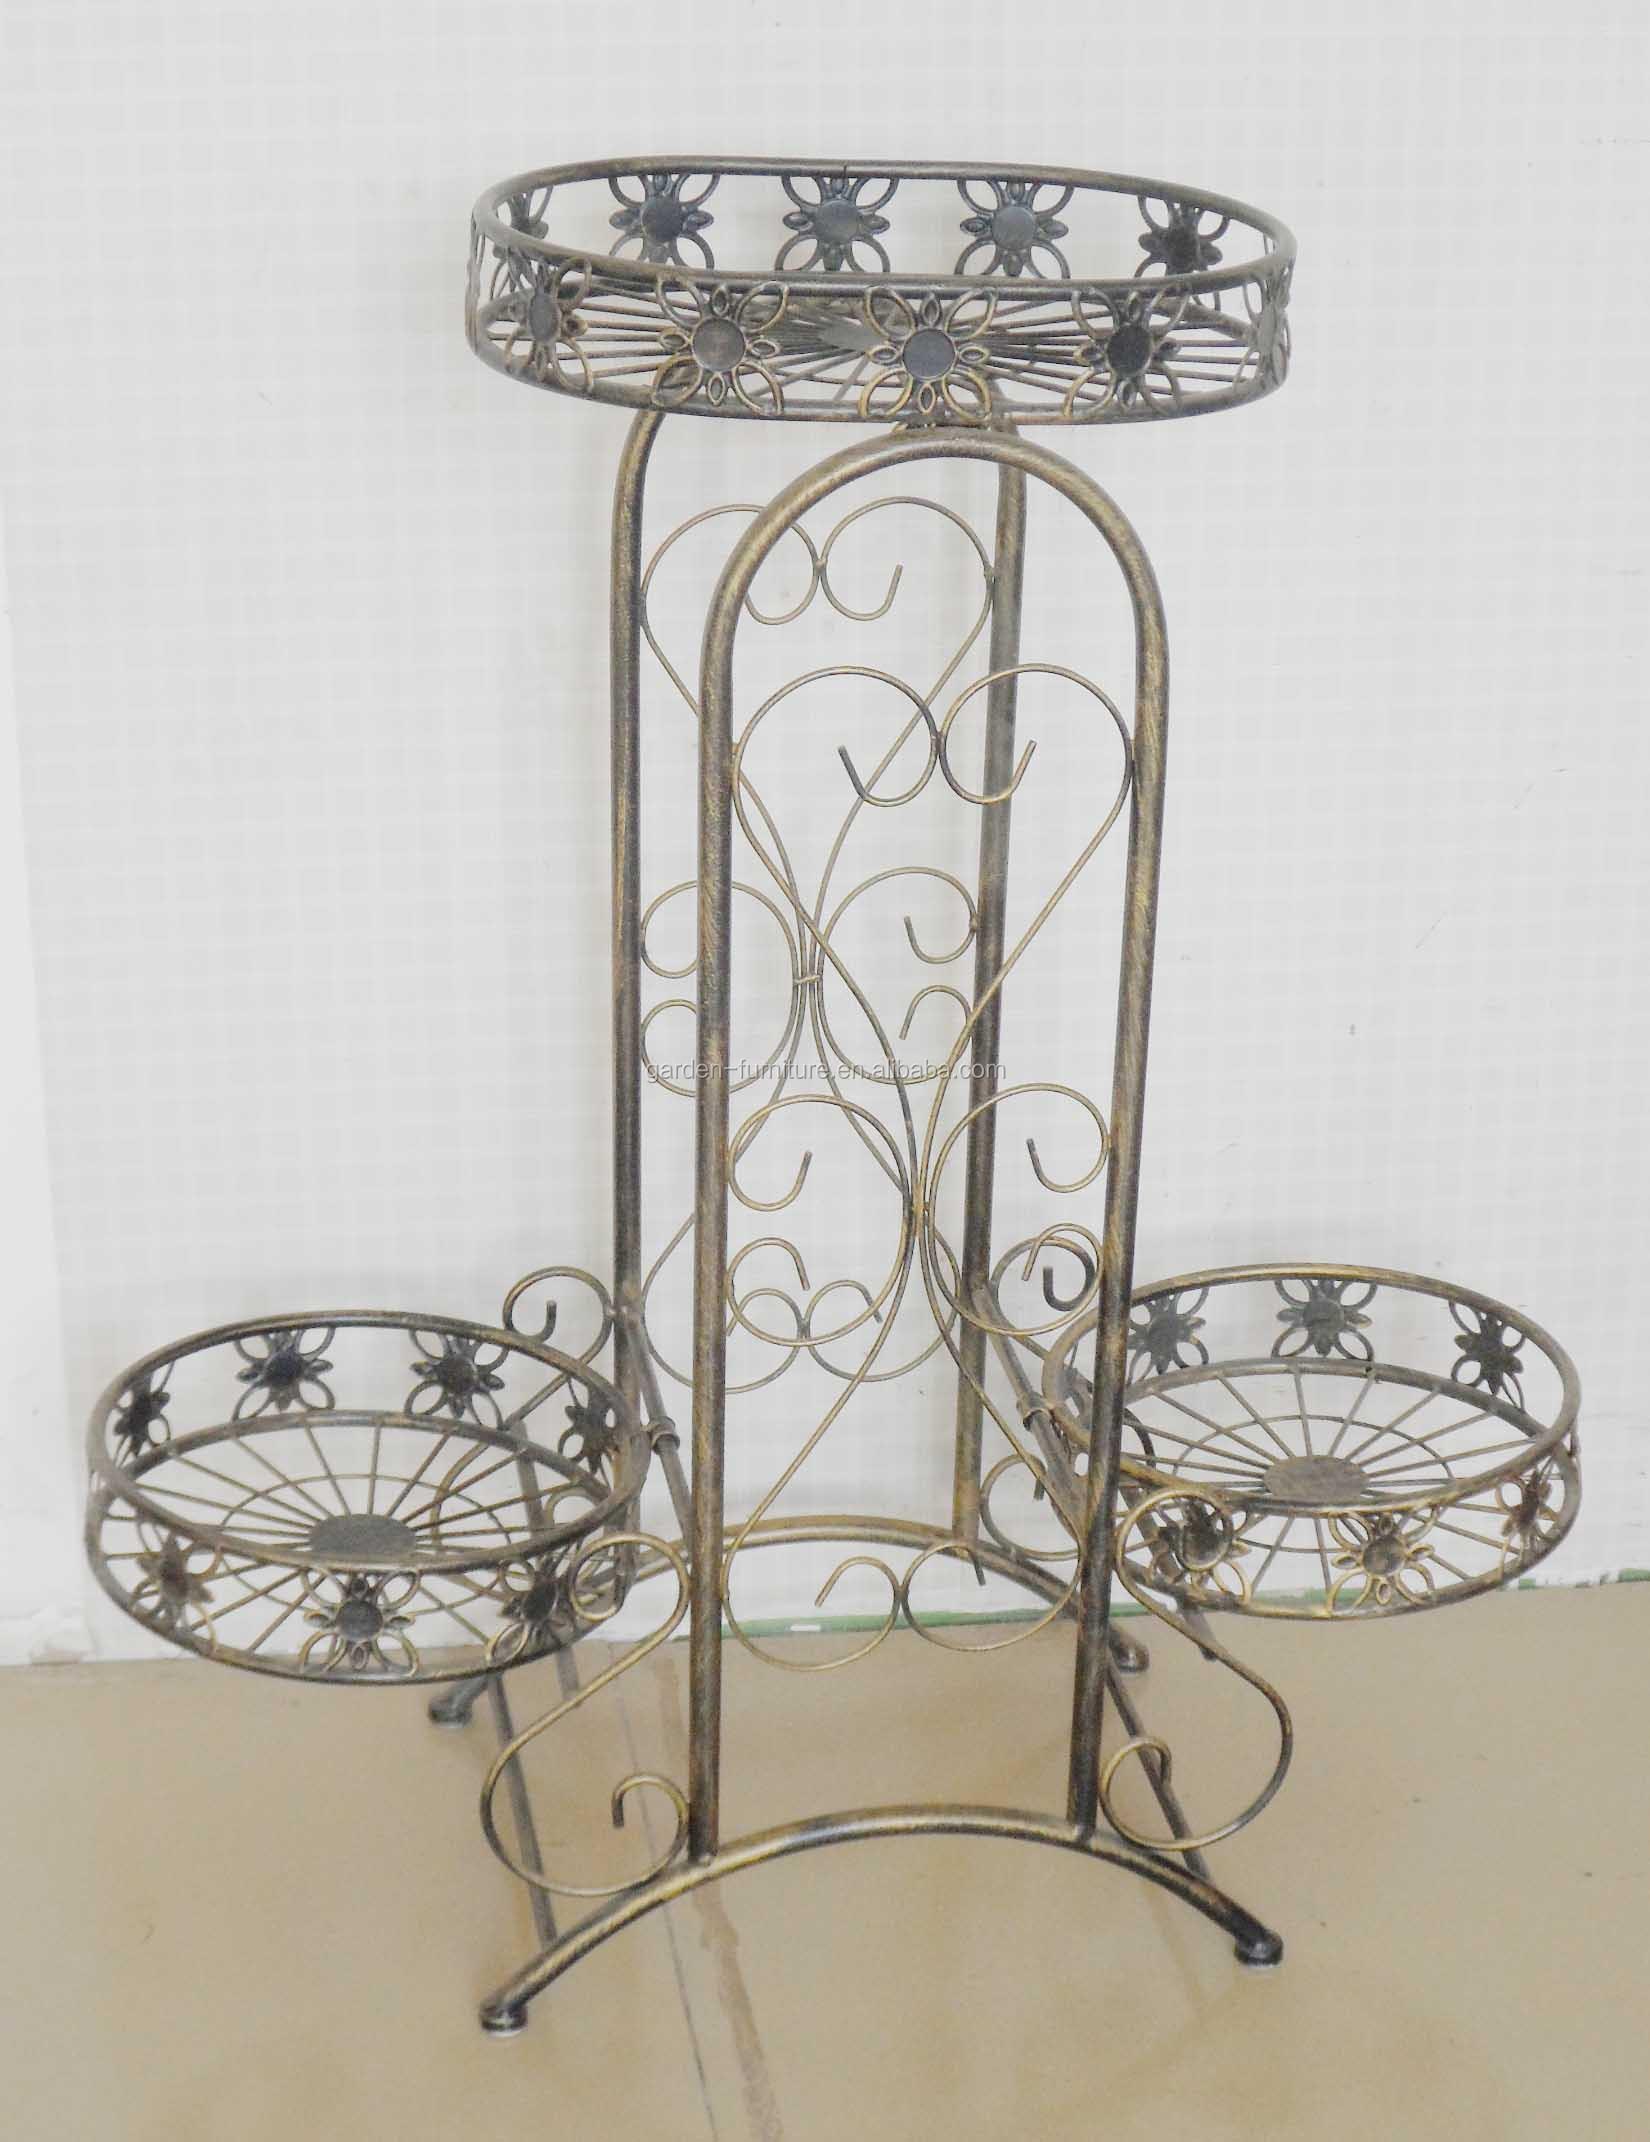 Handicraft Home Indoor Outdoor Garden Furniture Decor Metal Flower Shelf  Wrought Iron Pot Plant Holder